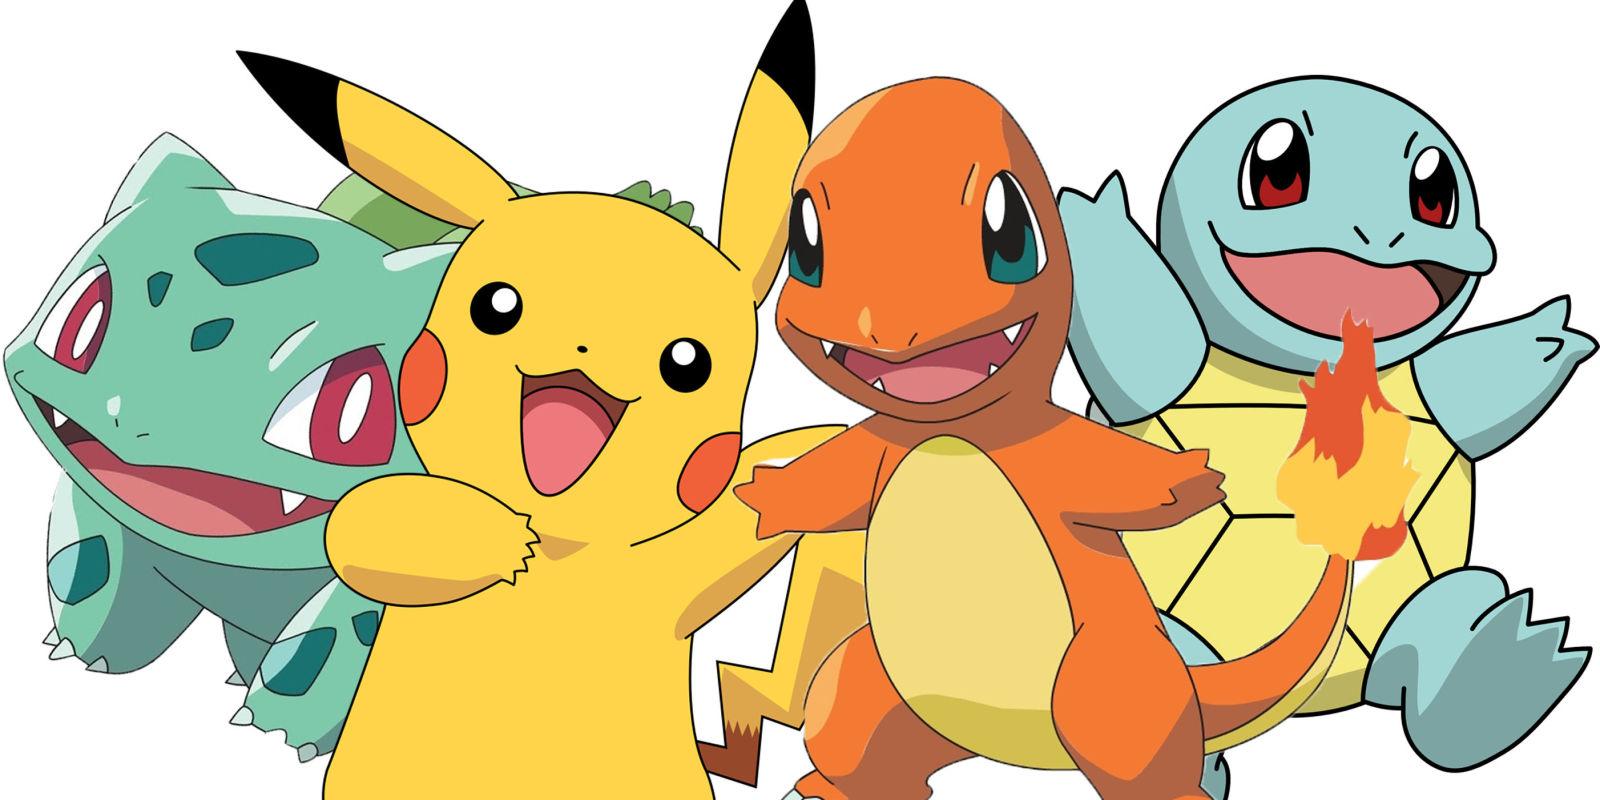 Pikachu clipart charmander This knows  best score